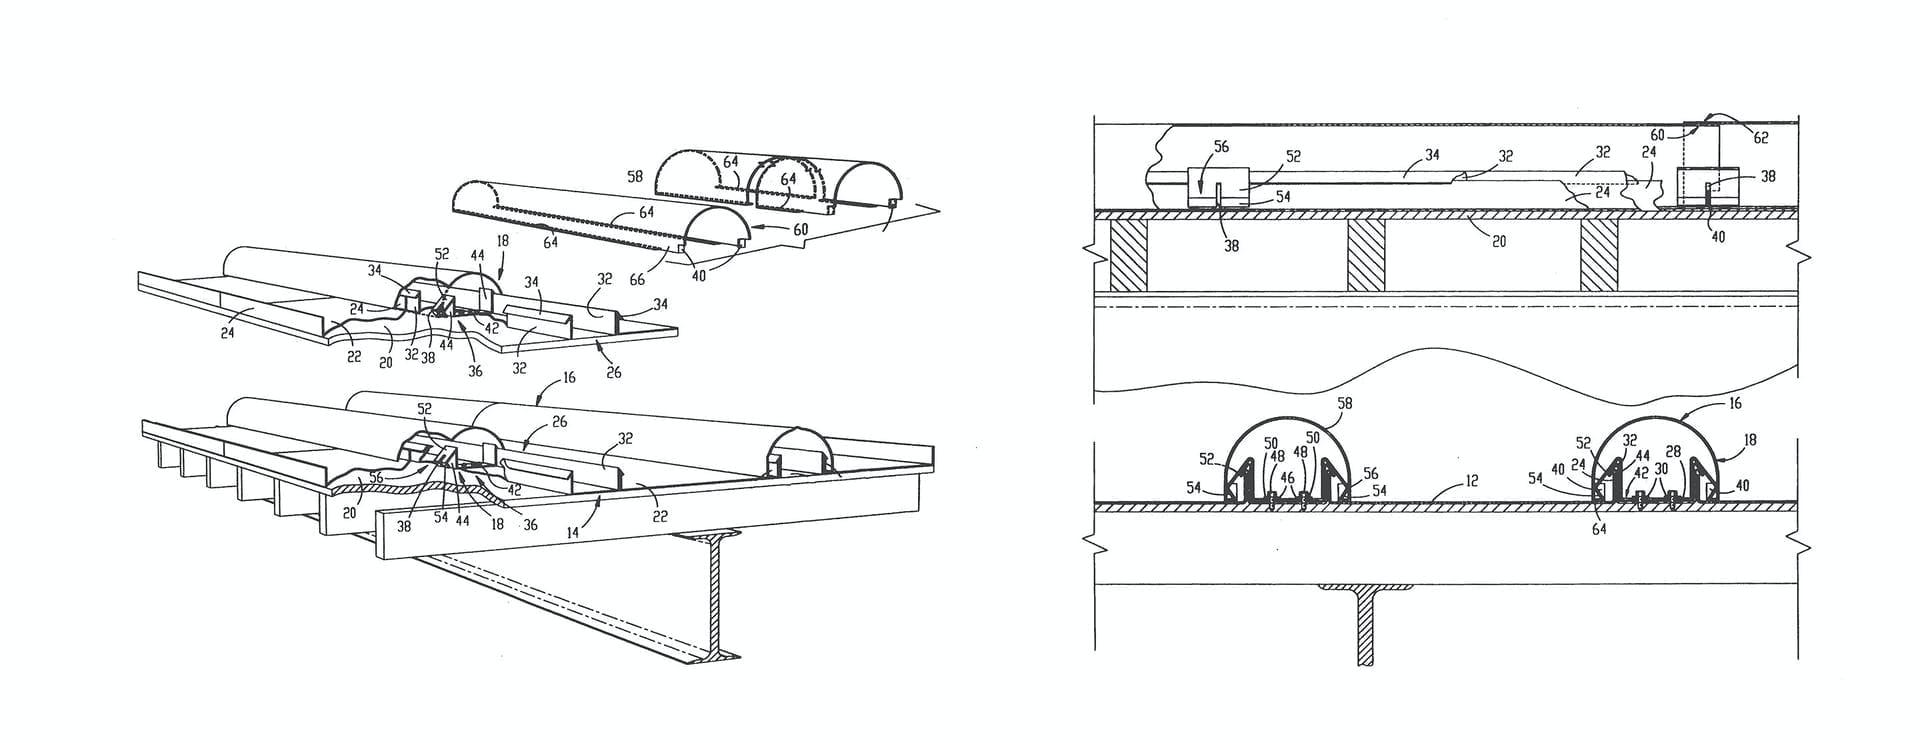 ZAHNER PATENT IMAGES FOR IMPROVED BOLD BATTEN ROOF SYSTEM.